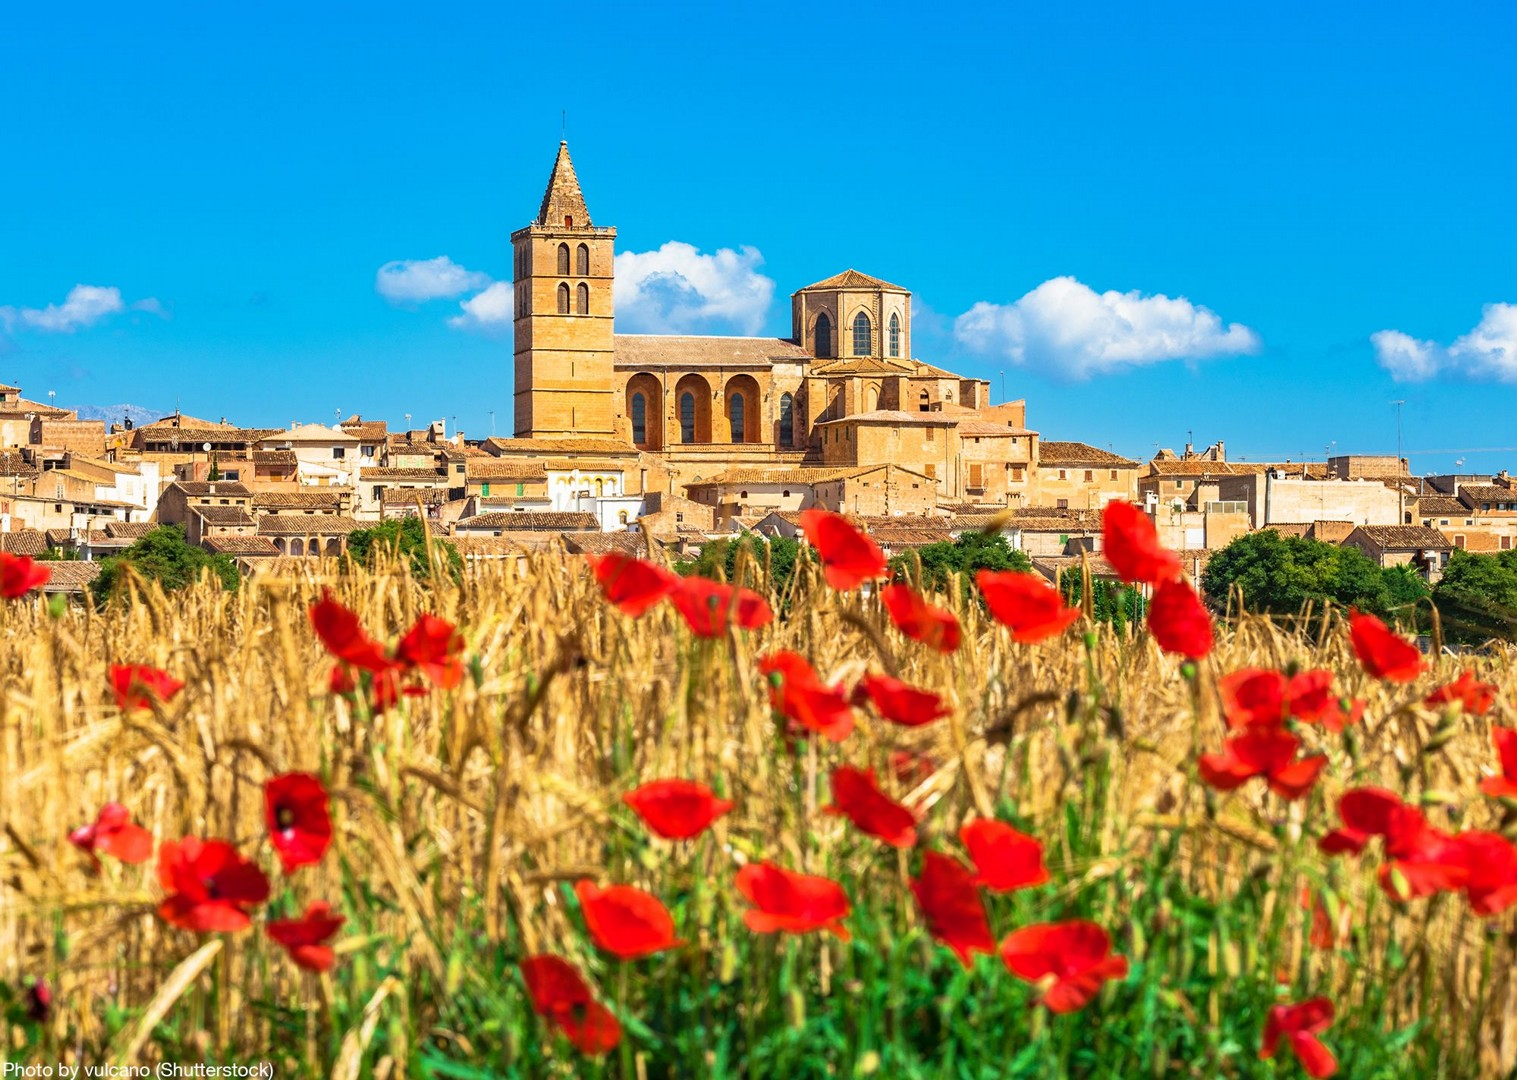 cistus-roses-traditional-mallorca-experience-self-guided-cycling.jpg - Spain - Mallorca - Self-Guided Leisure Cycling Holiday - Leisure Cycling